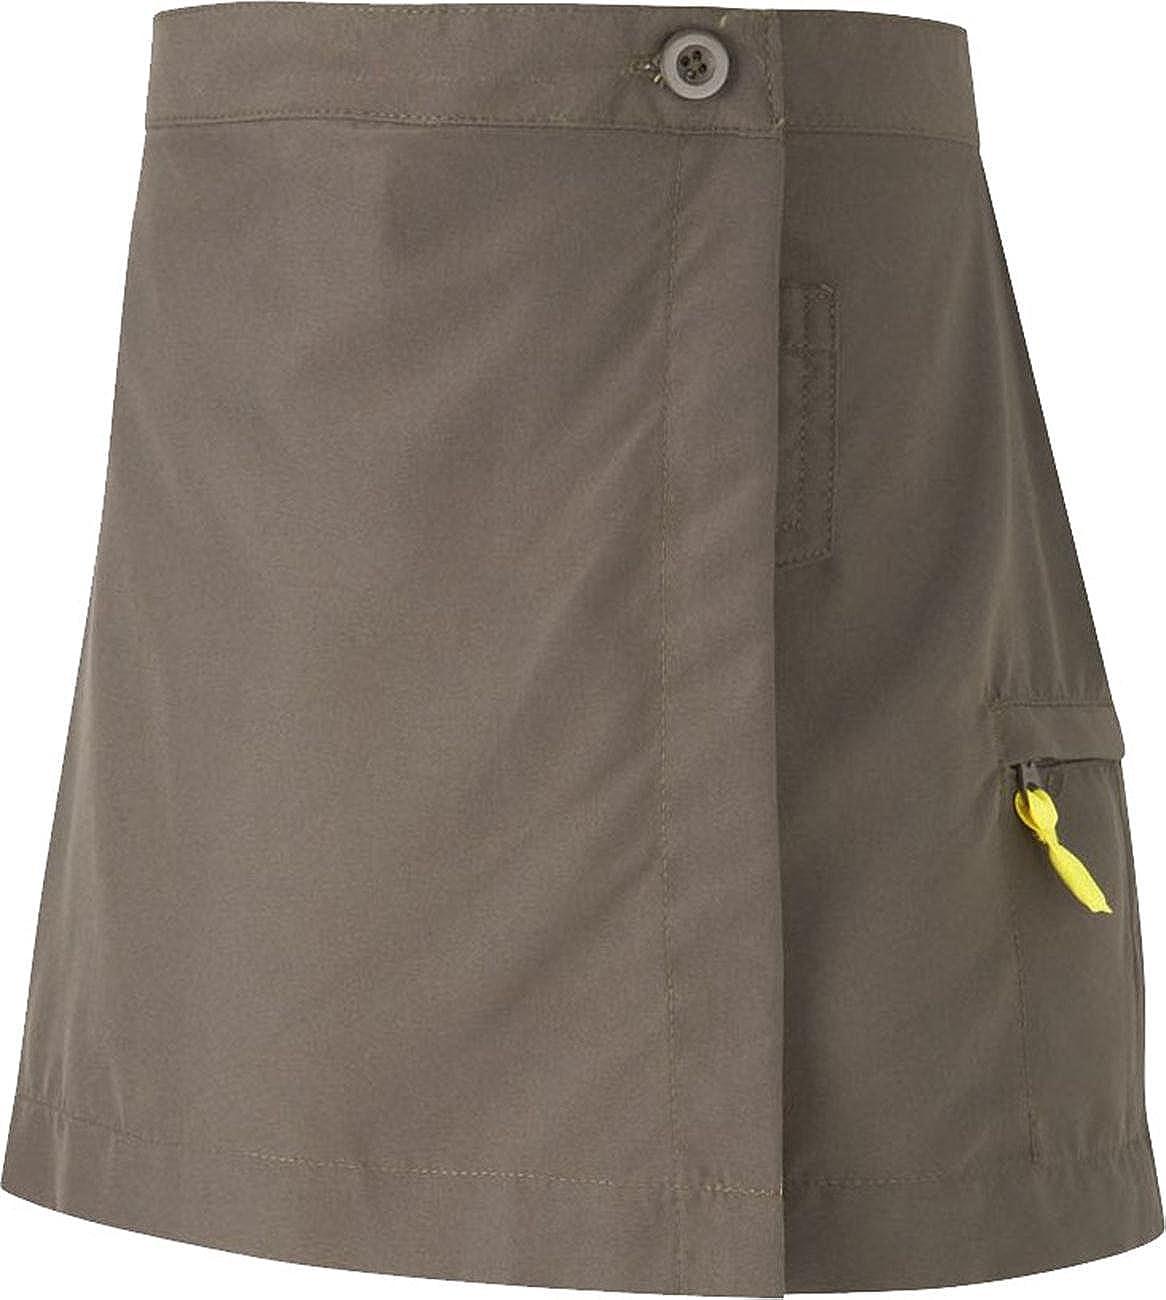 David Luke Official Brownies Girl Guides Uniform Skort Skirt Shorts Size 20-32